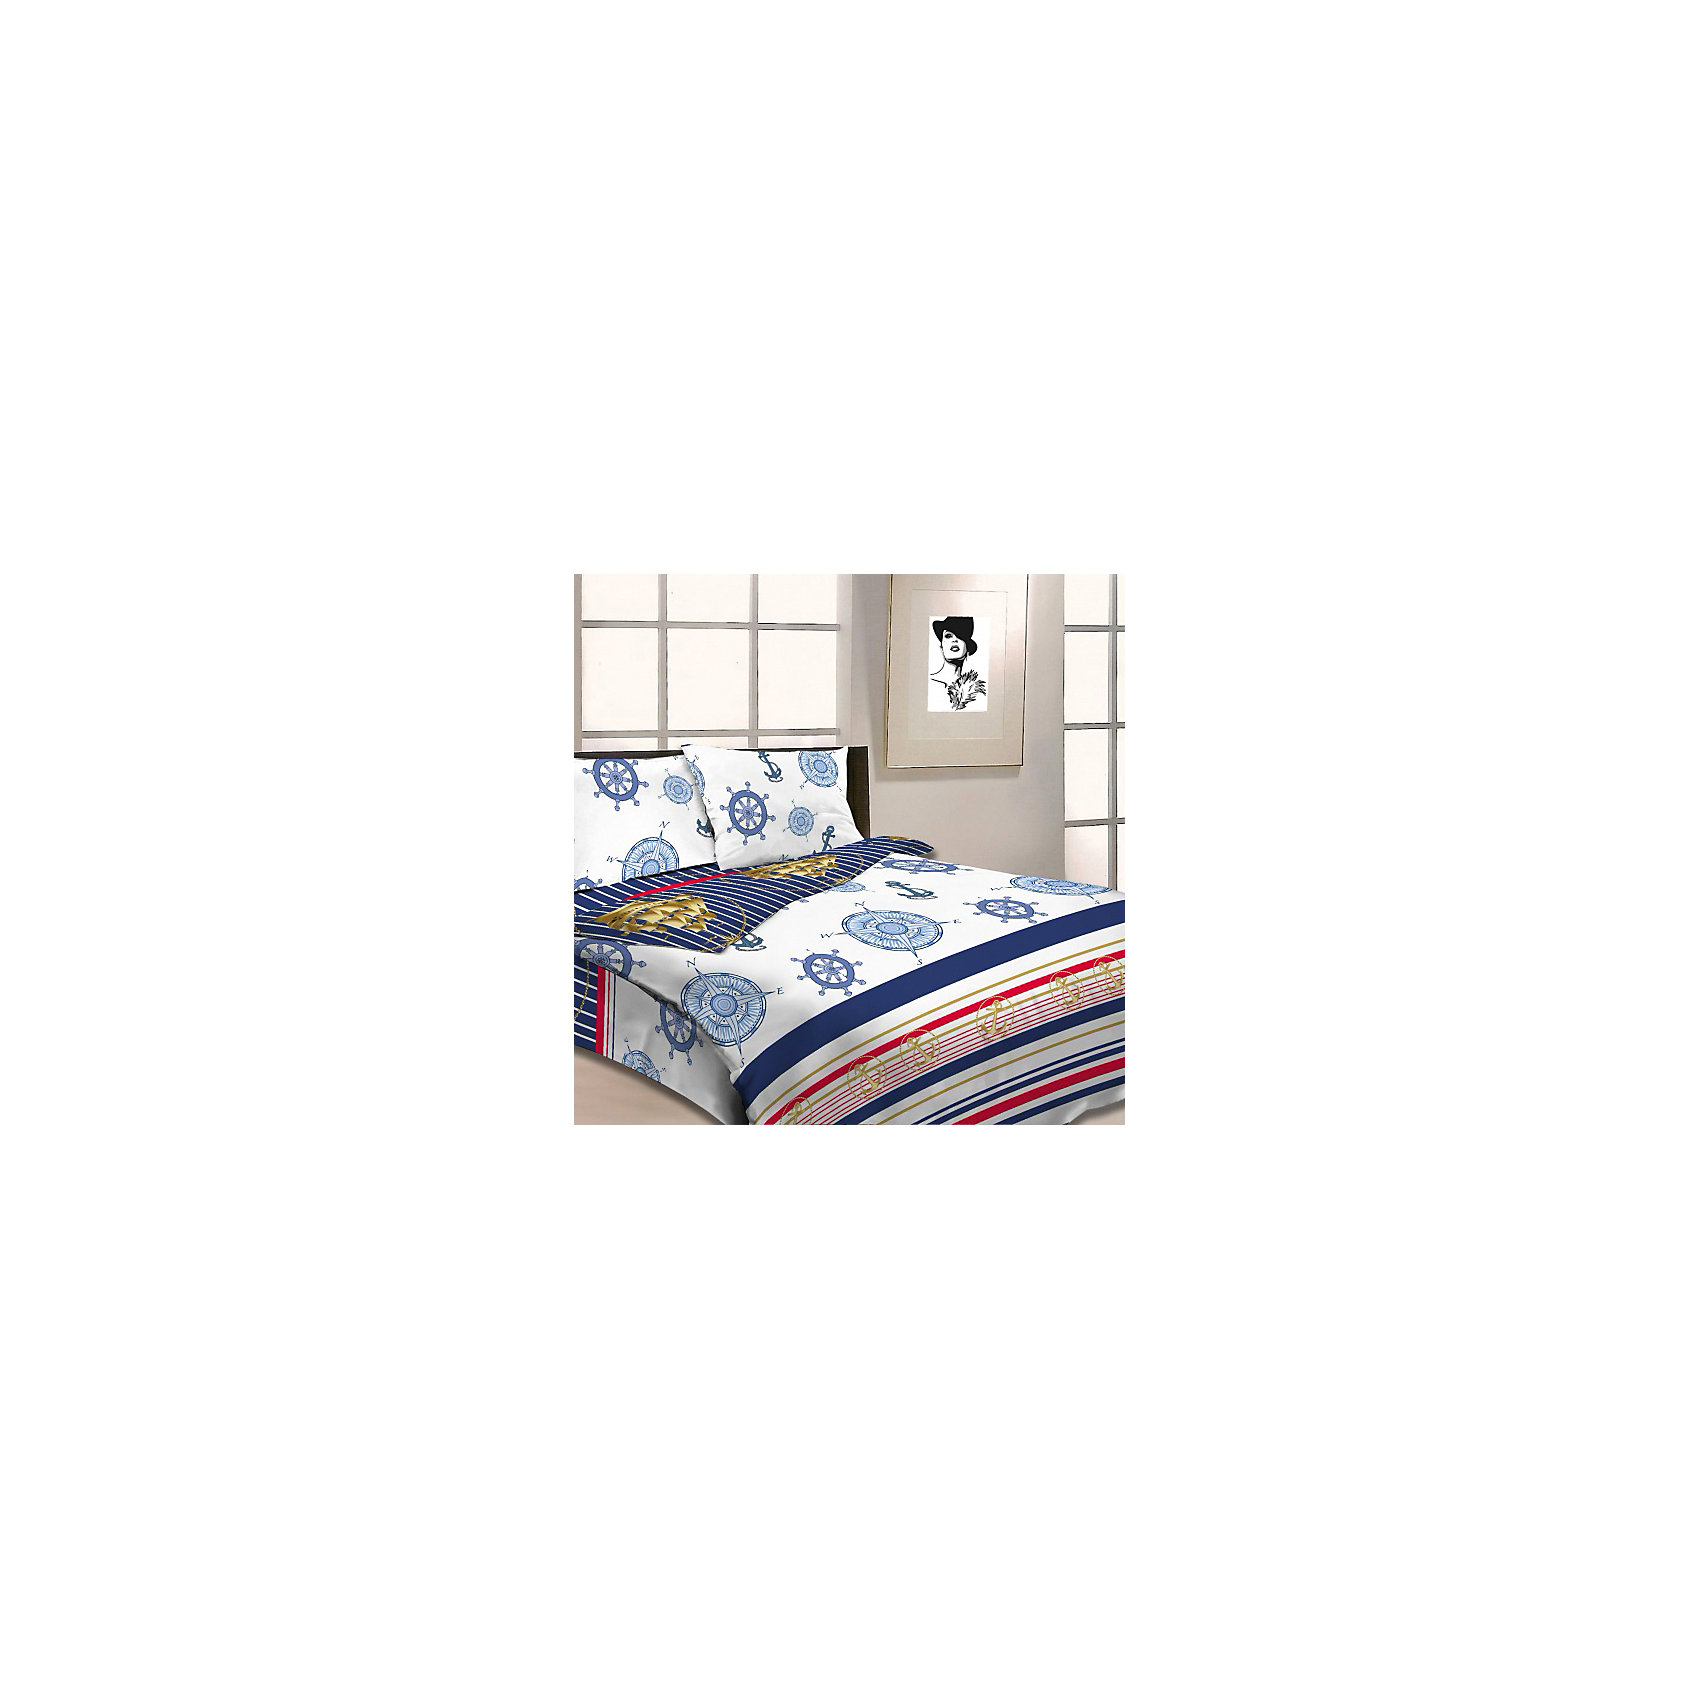 Letto Комплект Корабли 1,5-спальный (2 наволочки 70х70), Letto комплект белья letto дуэт семейный наволочки 70х70 цвет голубой b33 7